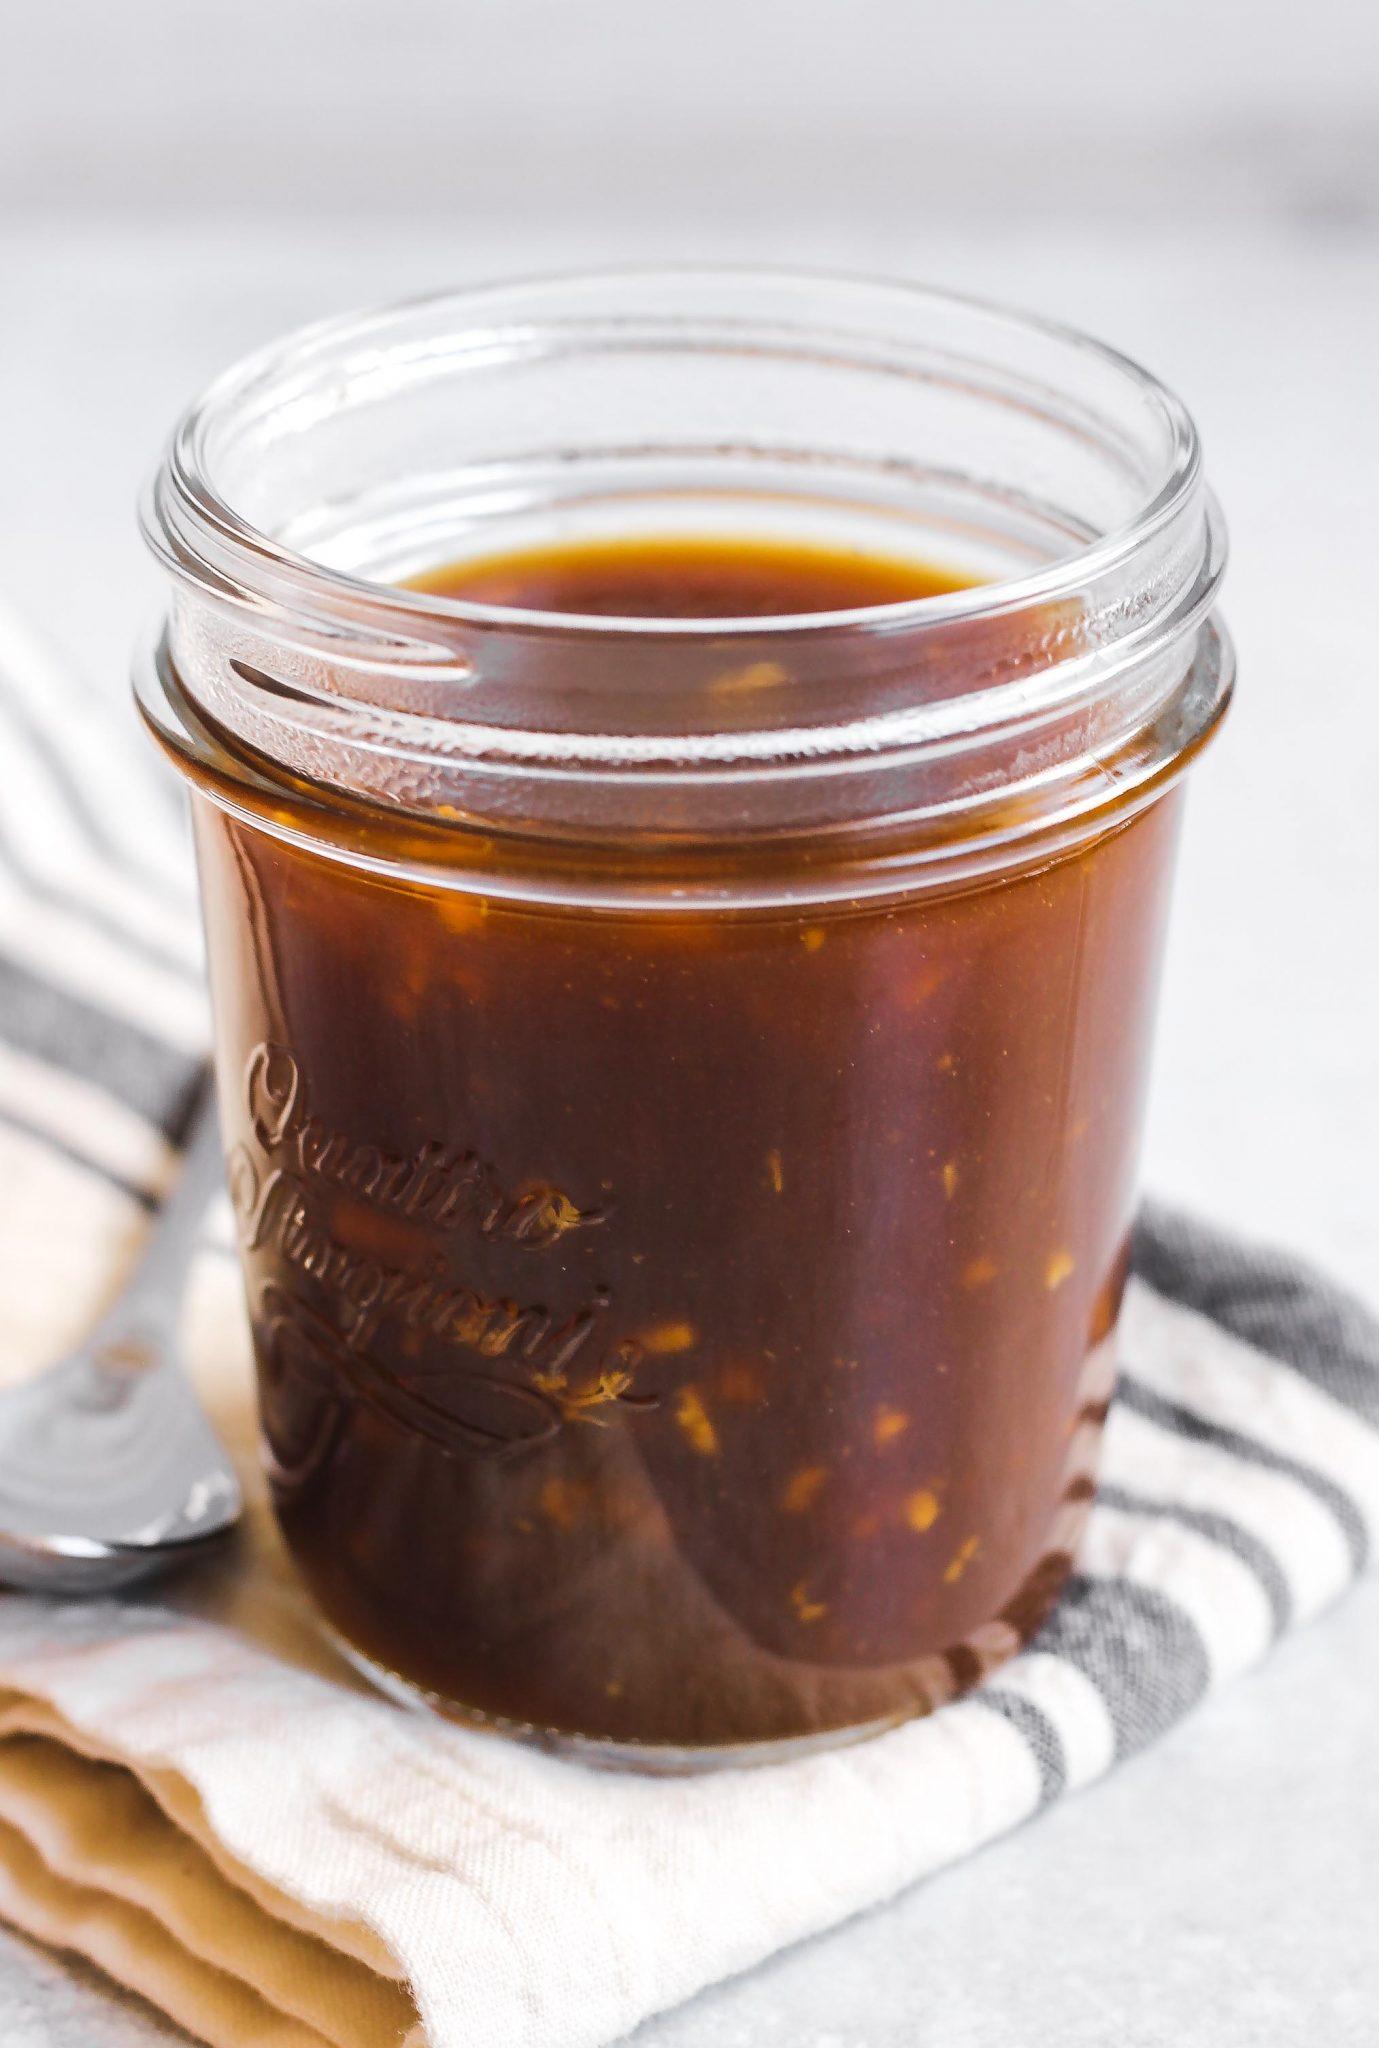 close-up view of teriyaki sauce in glass mason jar